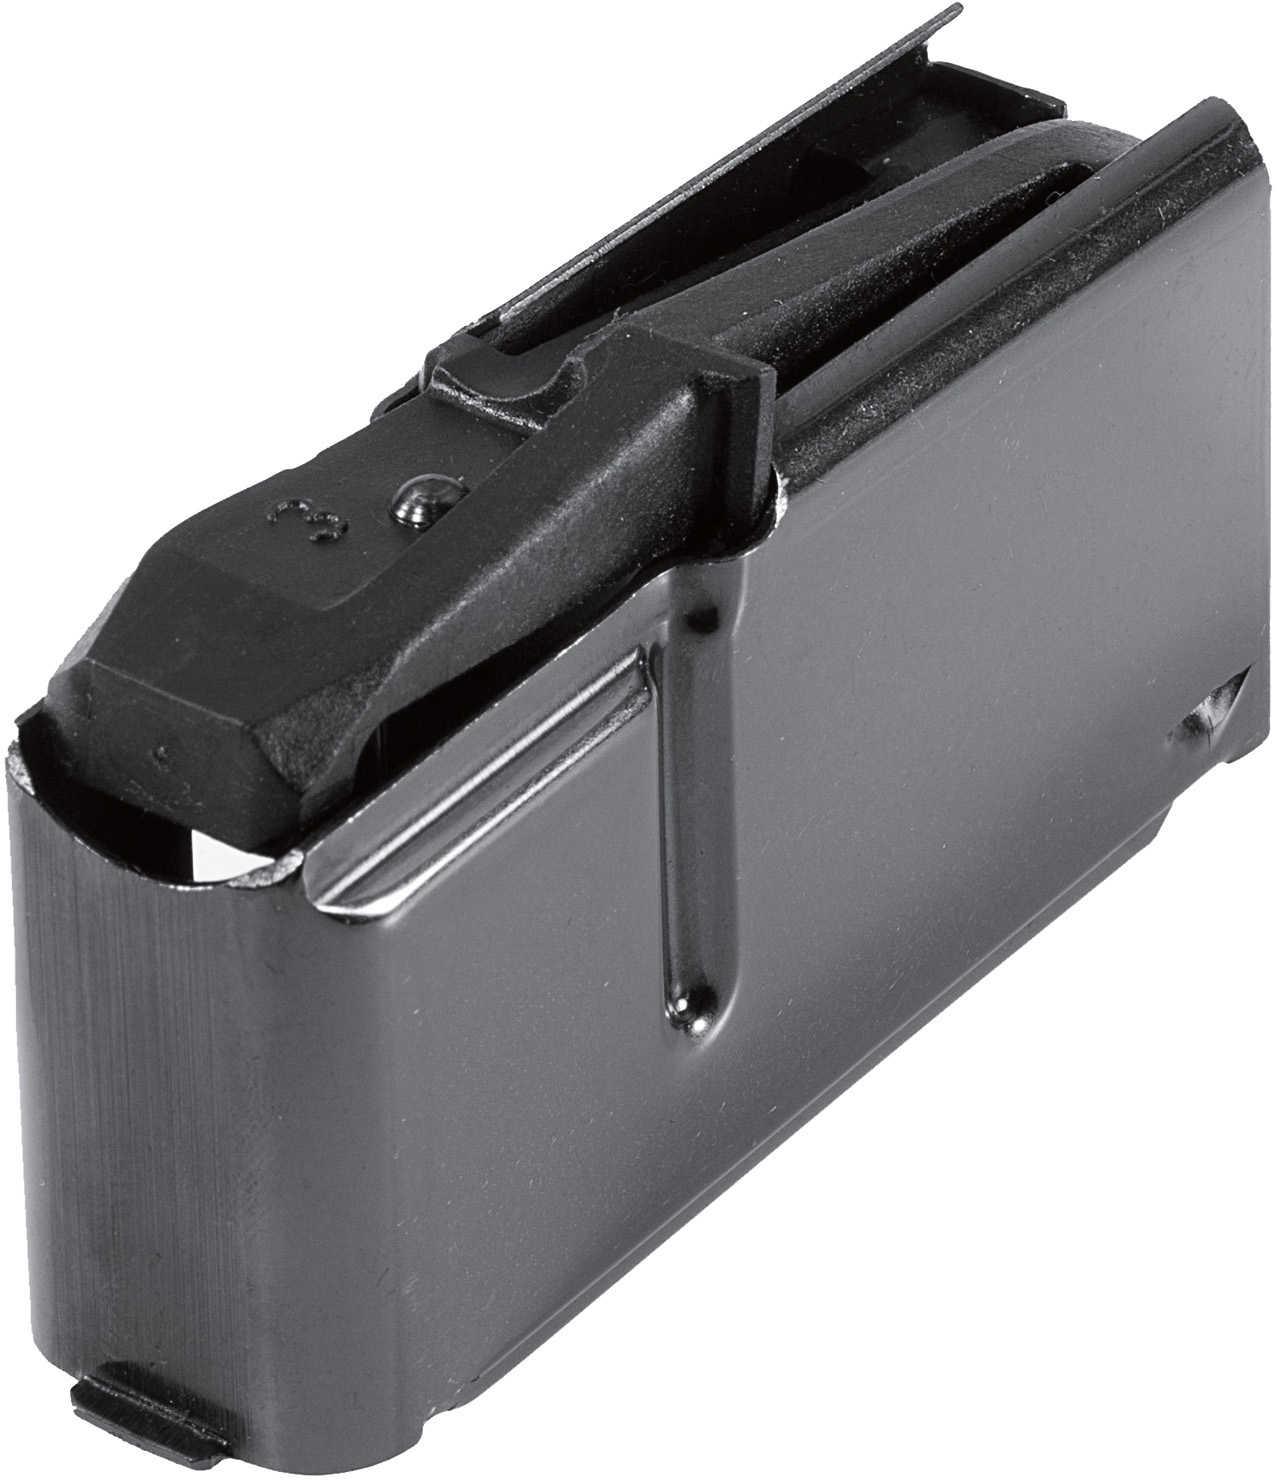 Browning BAR Magazine 270 Win, 25-06 Remington, 30-06 Springfield (Mark II), Capacity 4+1 112025024